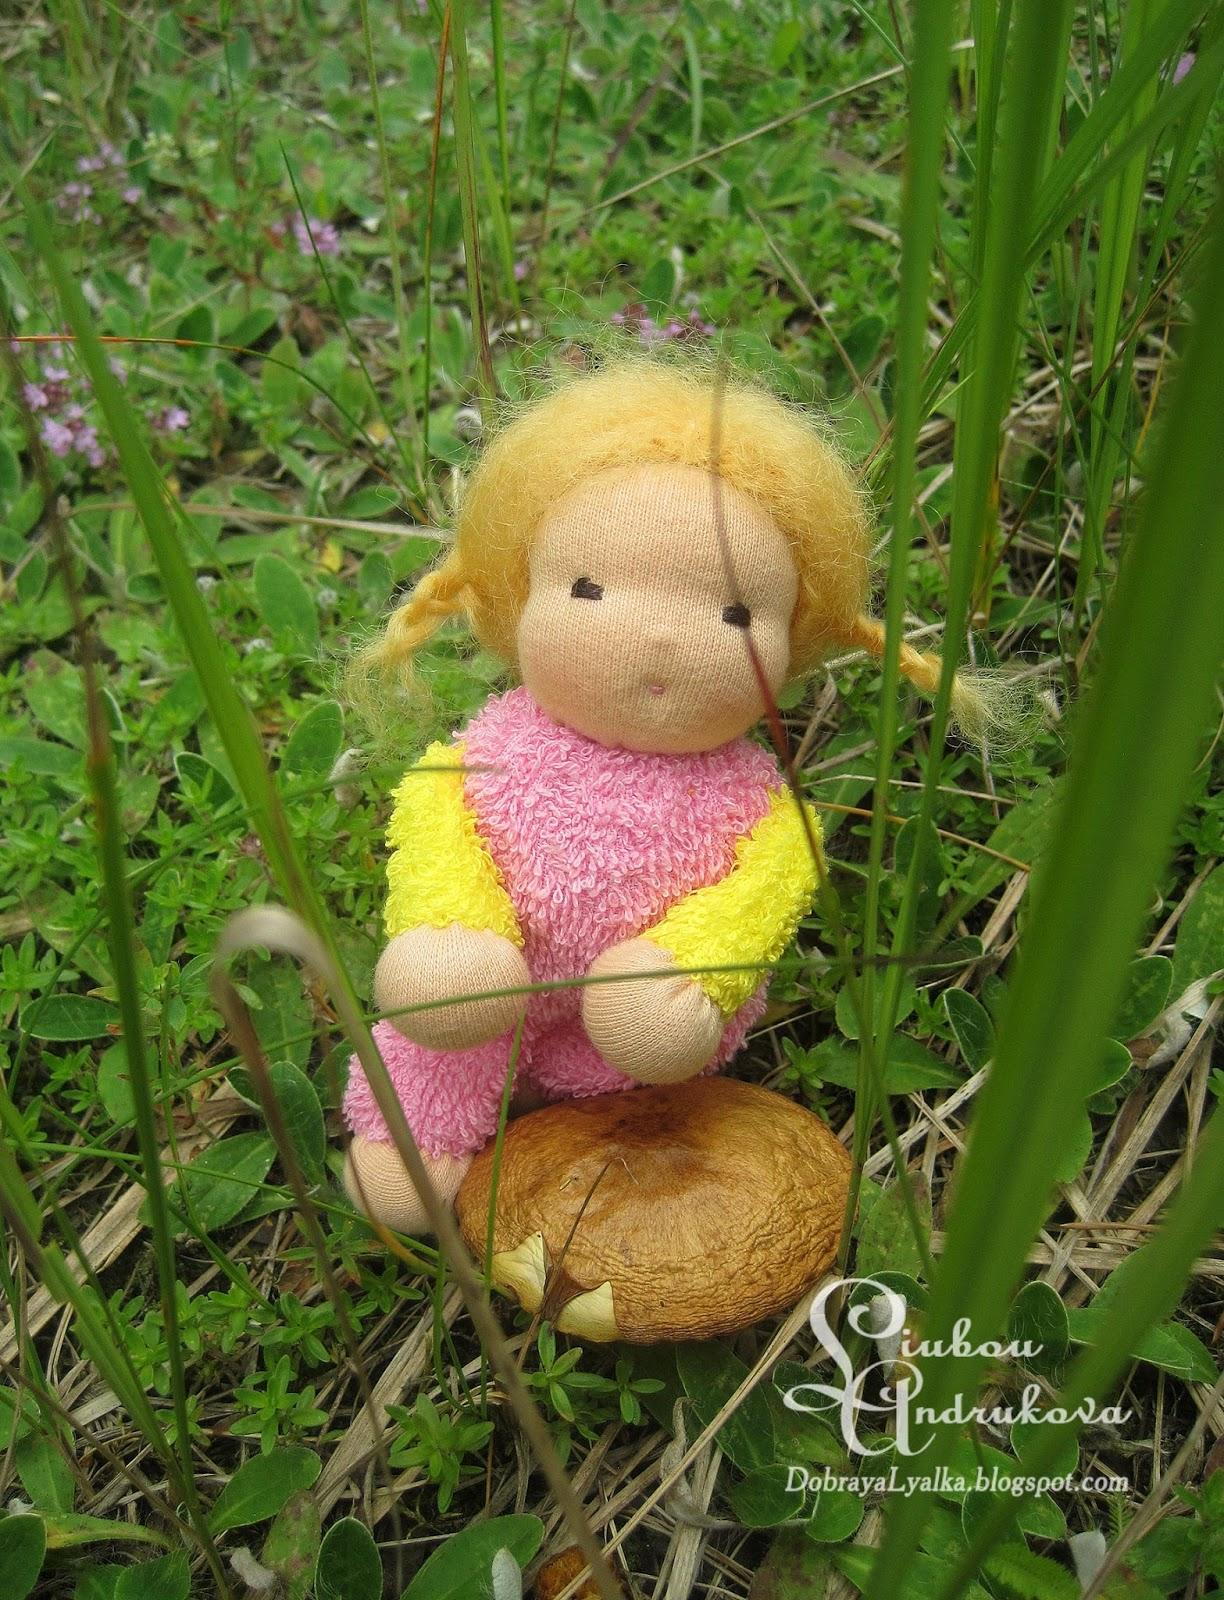 мягкая игровая куколка для ребенка